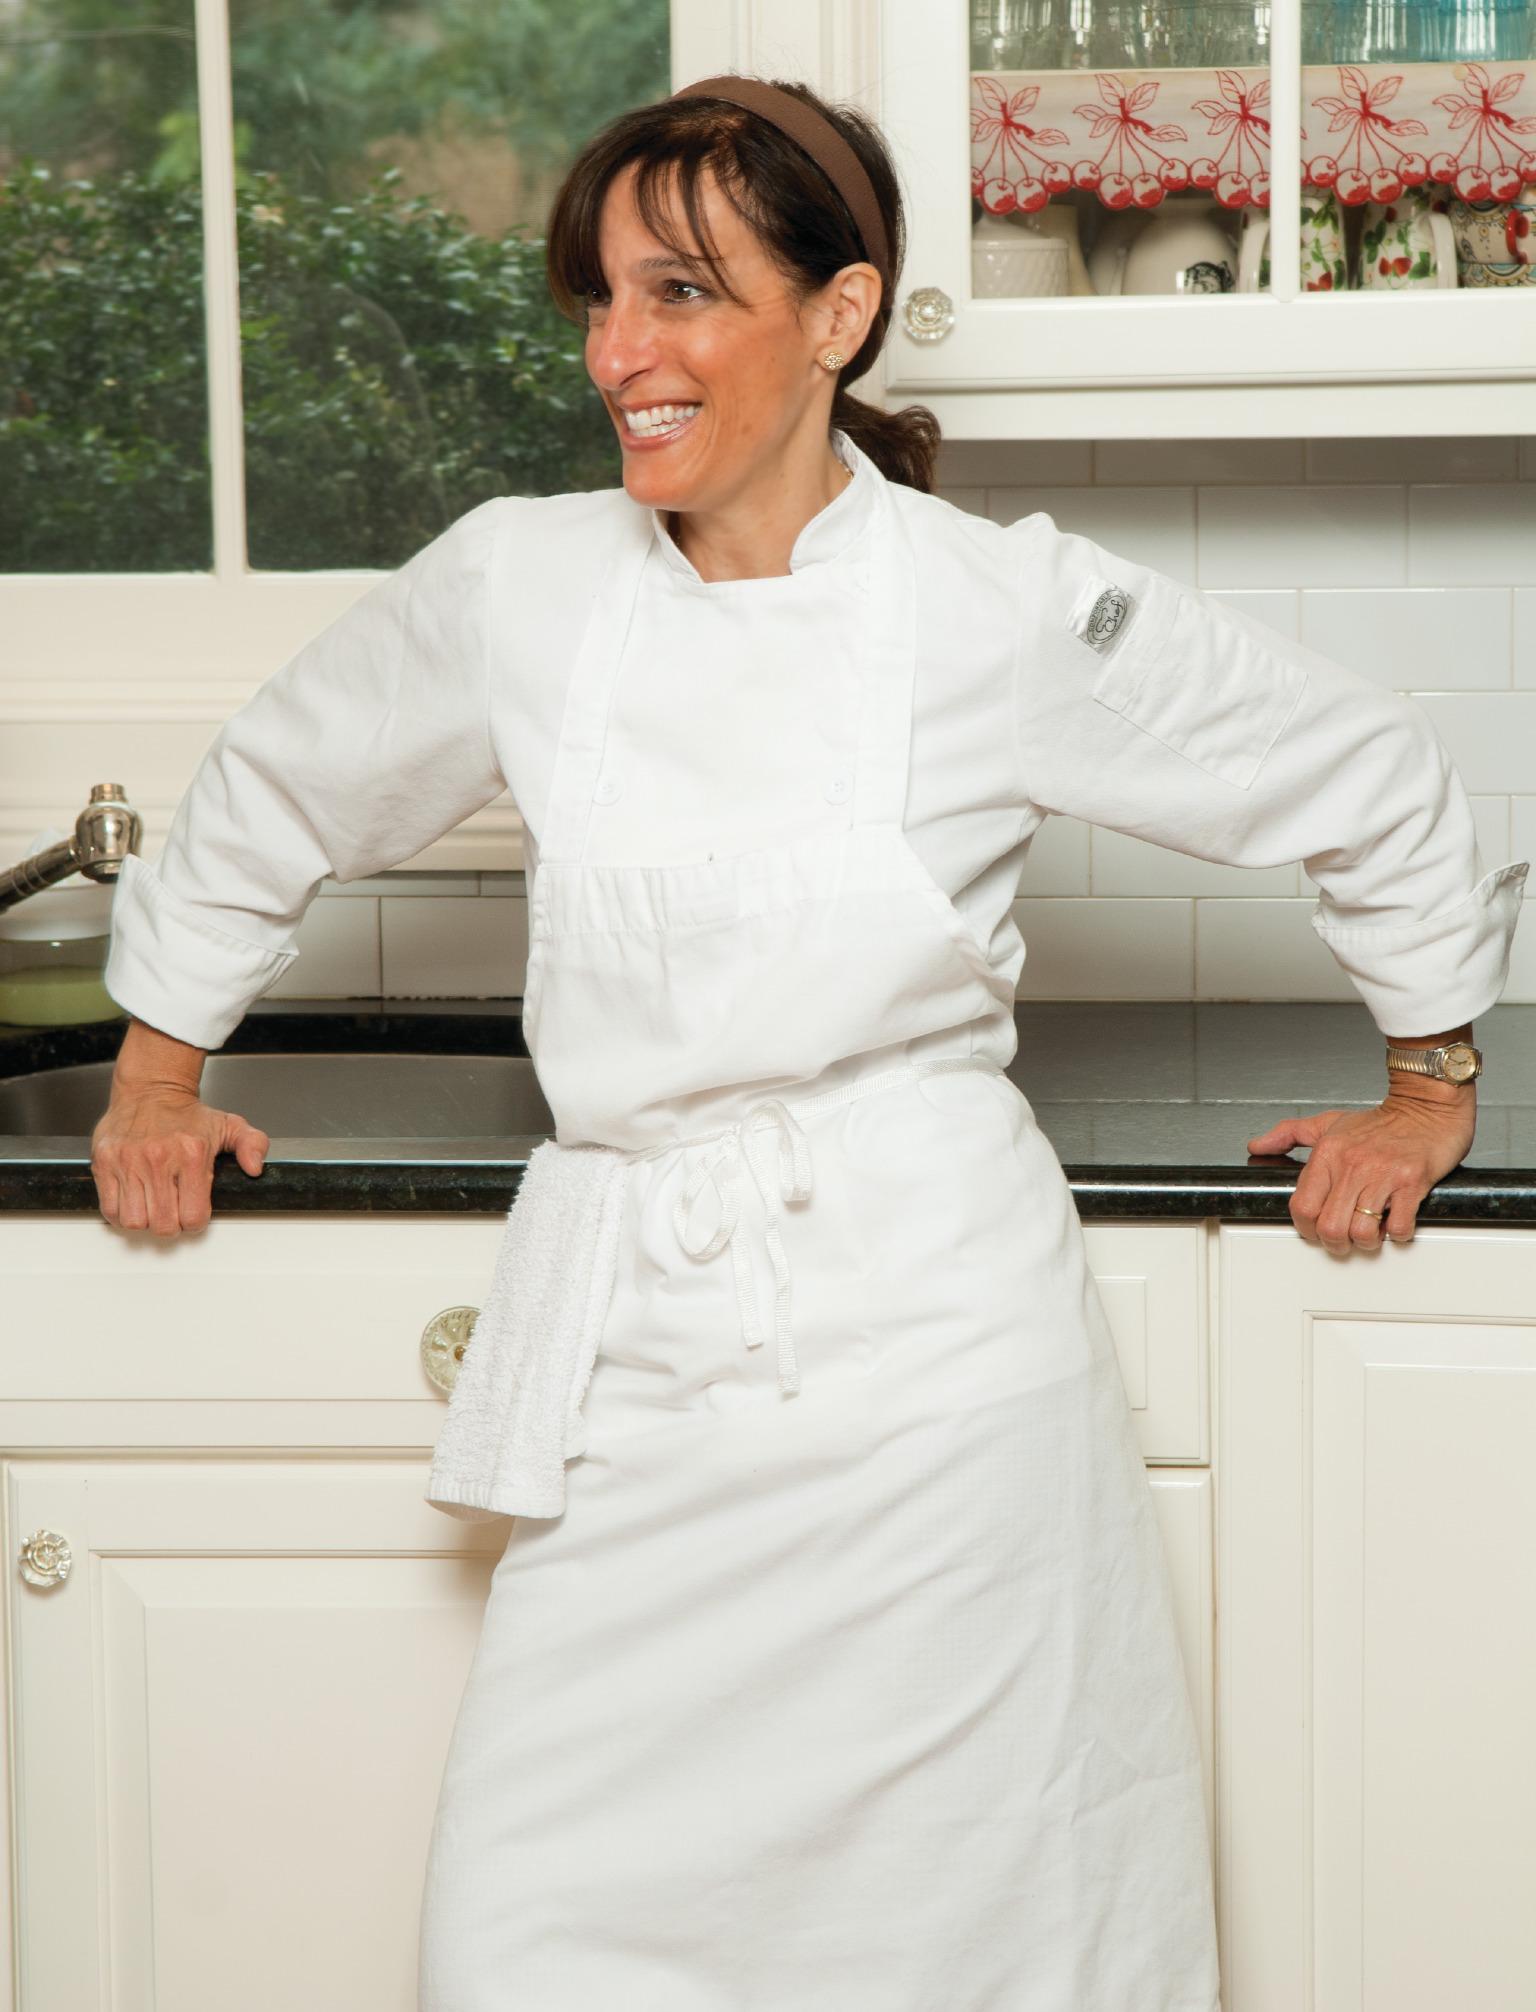 Instructor & Chef